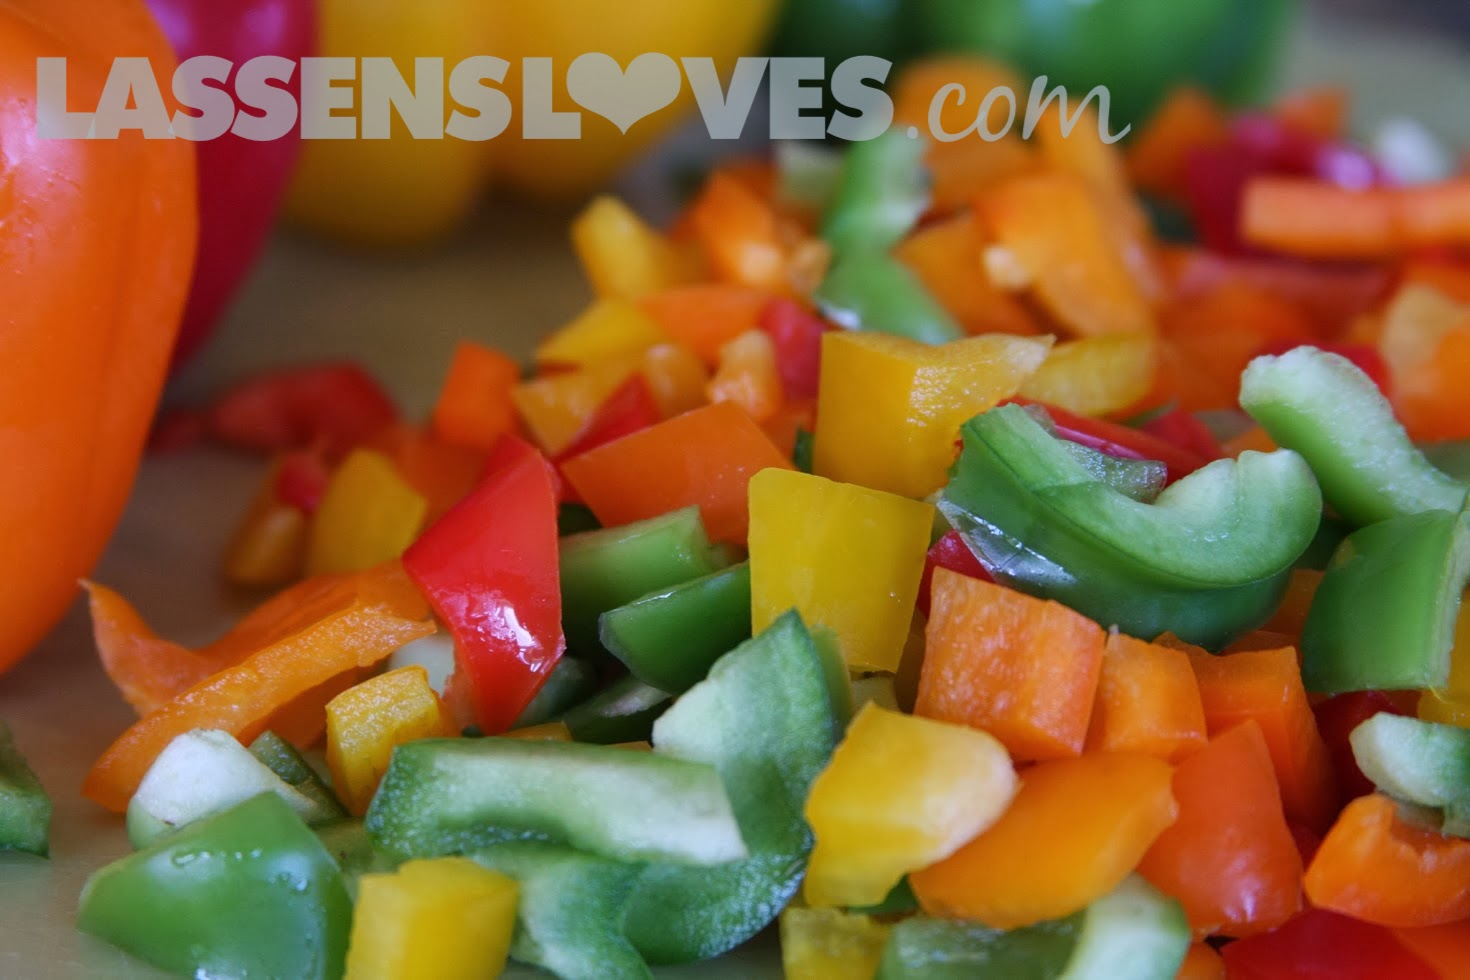 lassensloves.com, Lassen's, Lassens, organic+produce, peppers, why+eat+organic